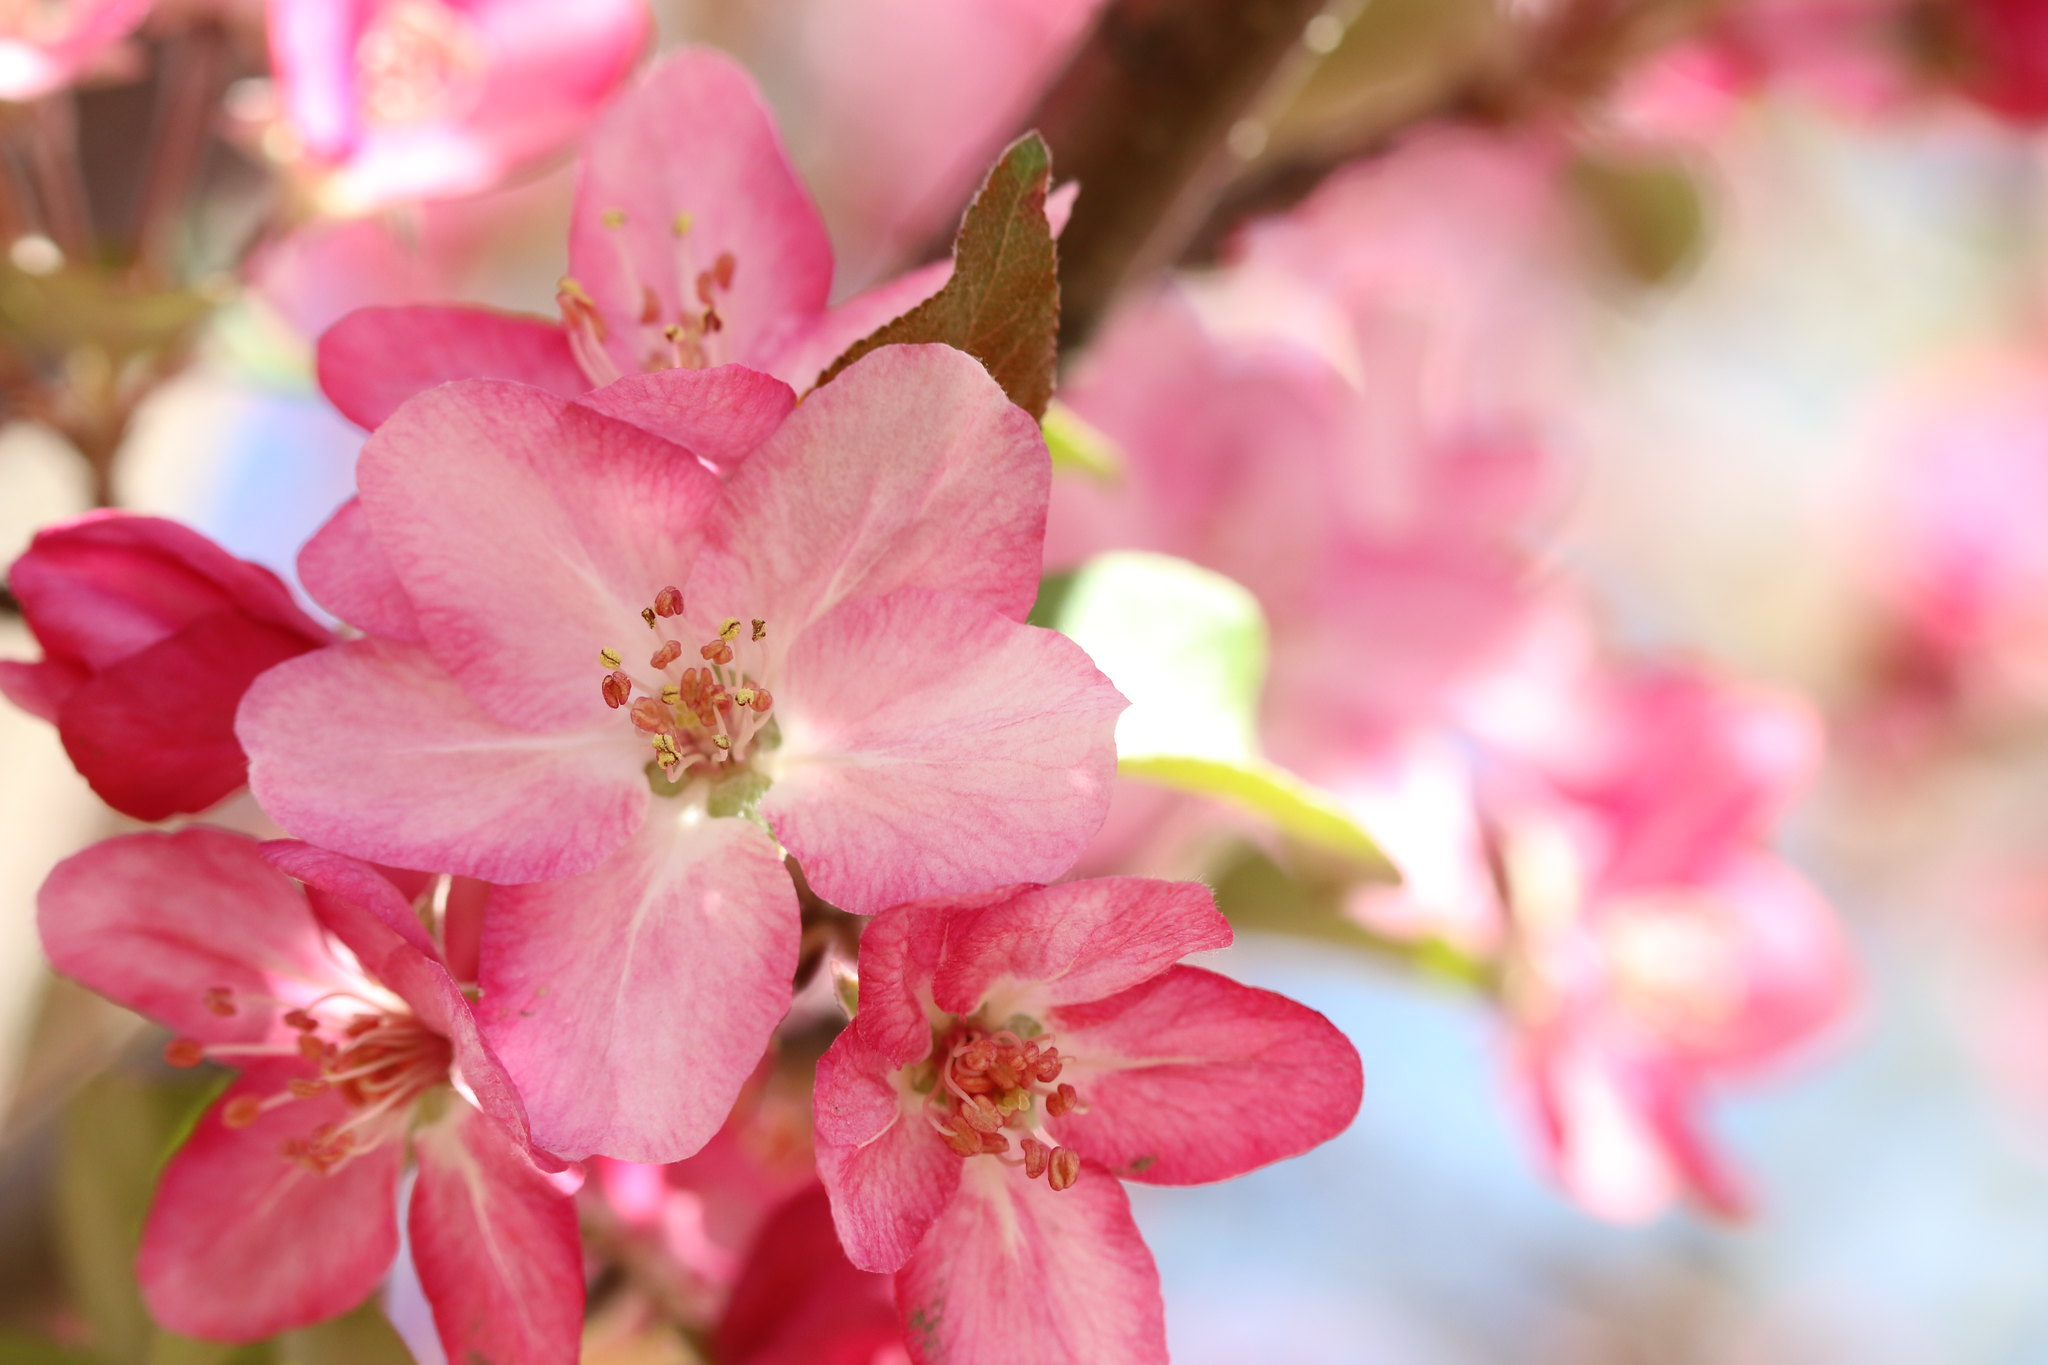 Bright in Bloom (SOTC 358/365)